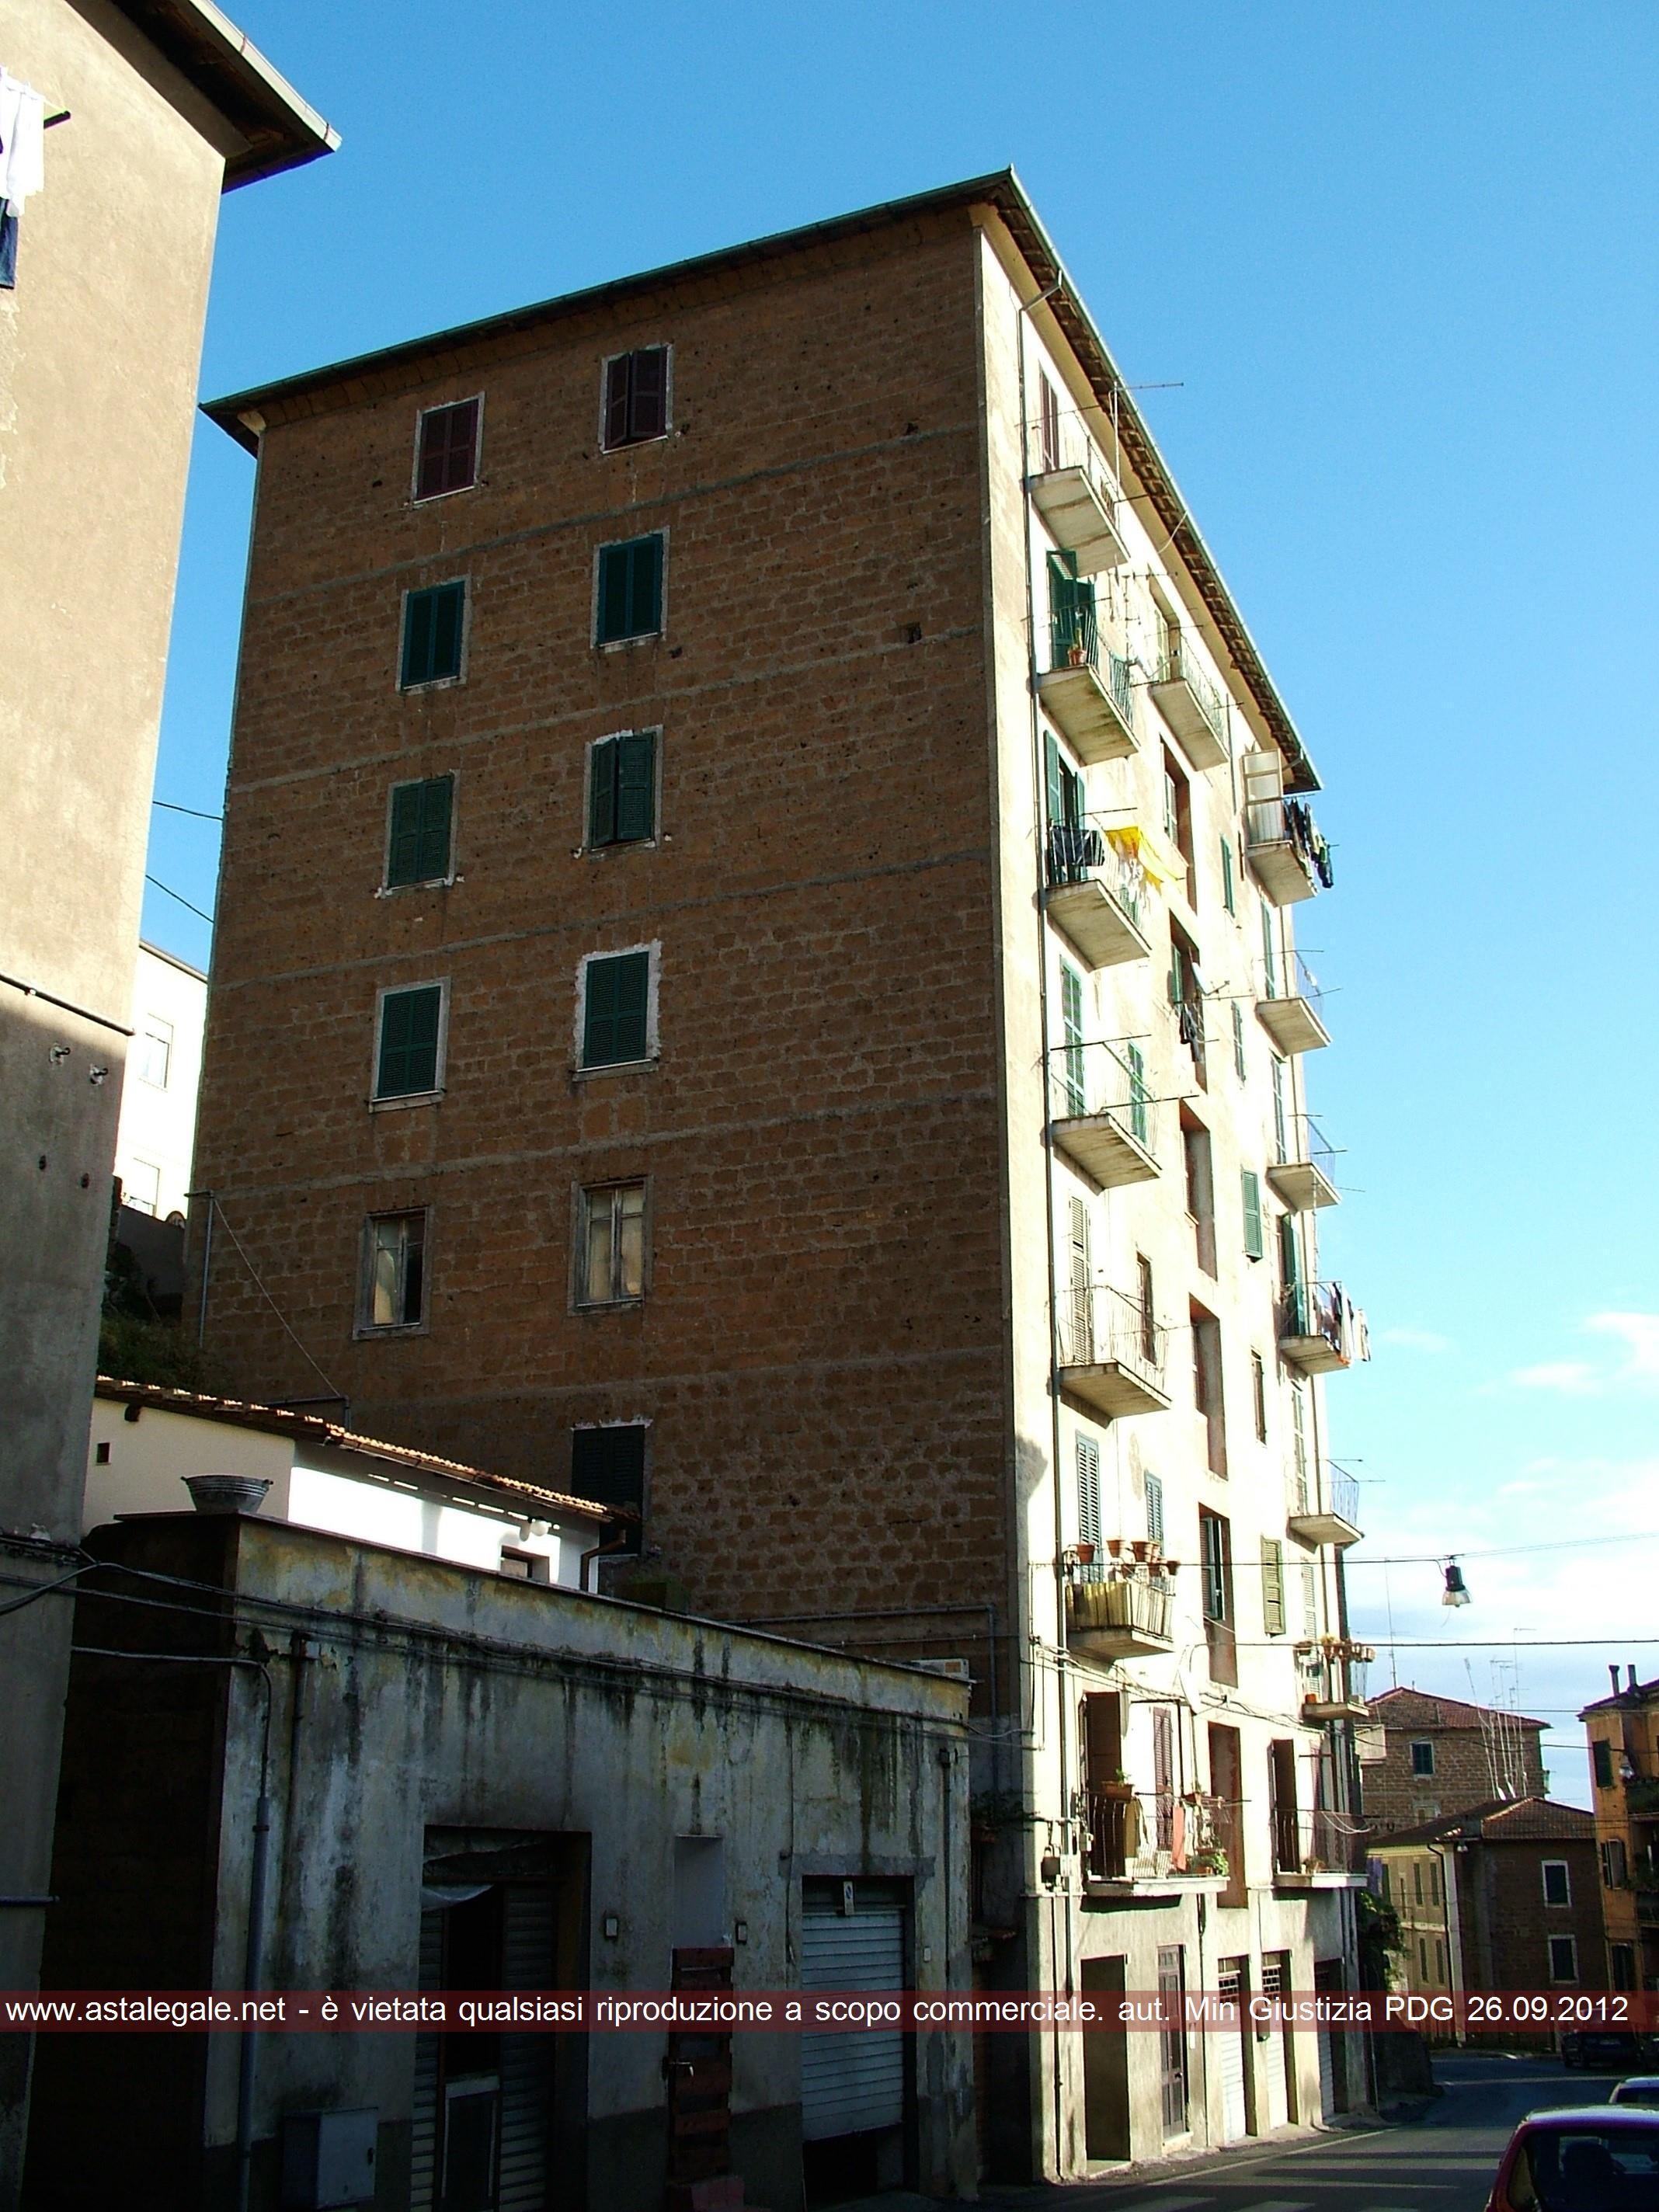 Vignanello (VT) Via della Vittoria 33